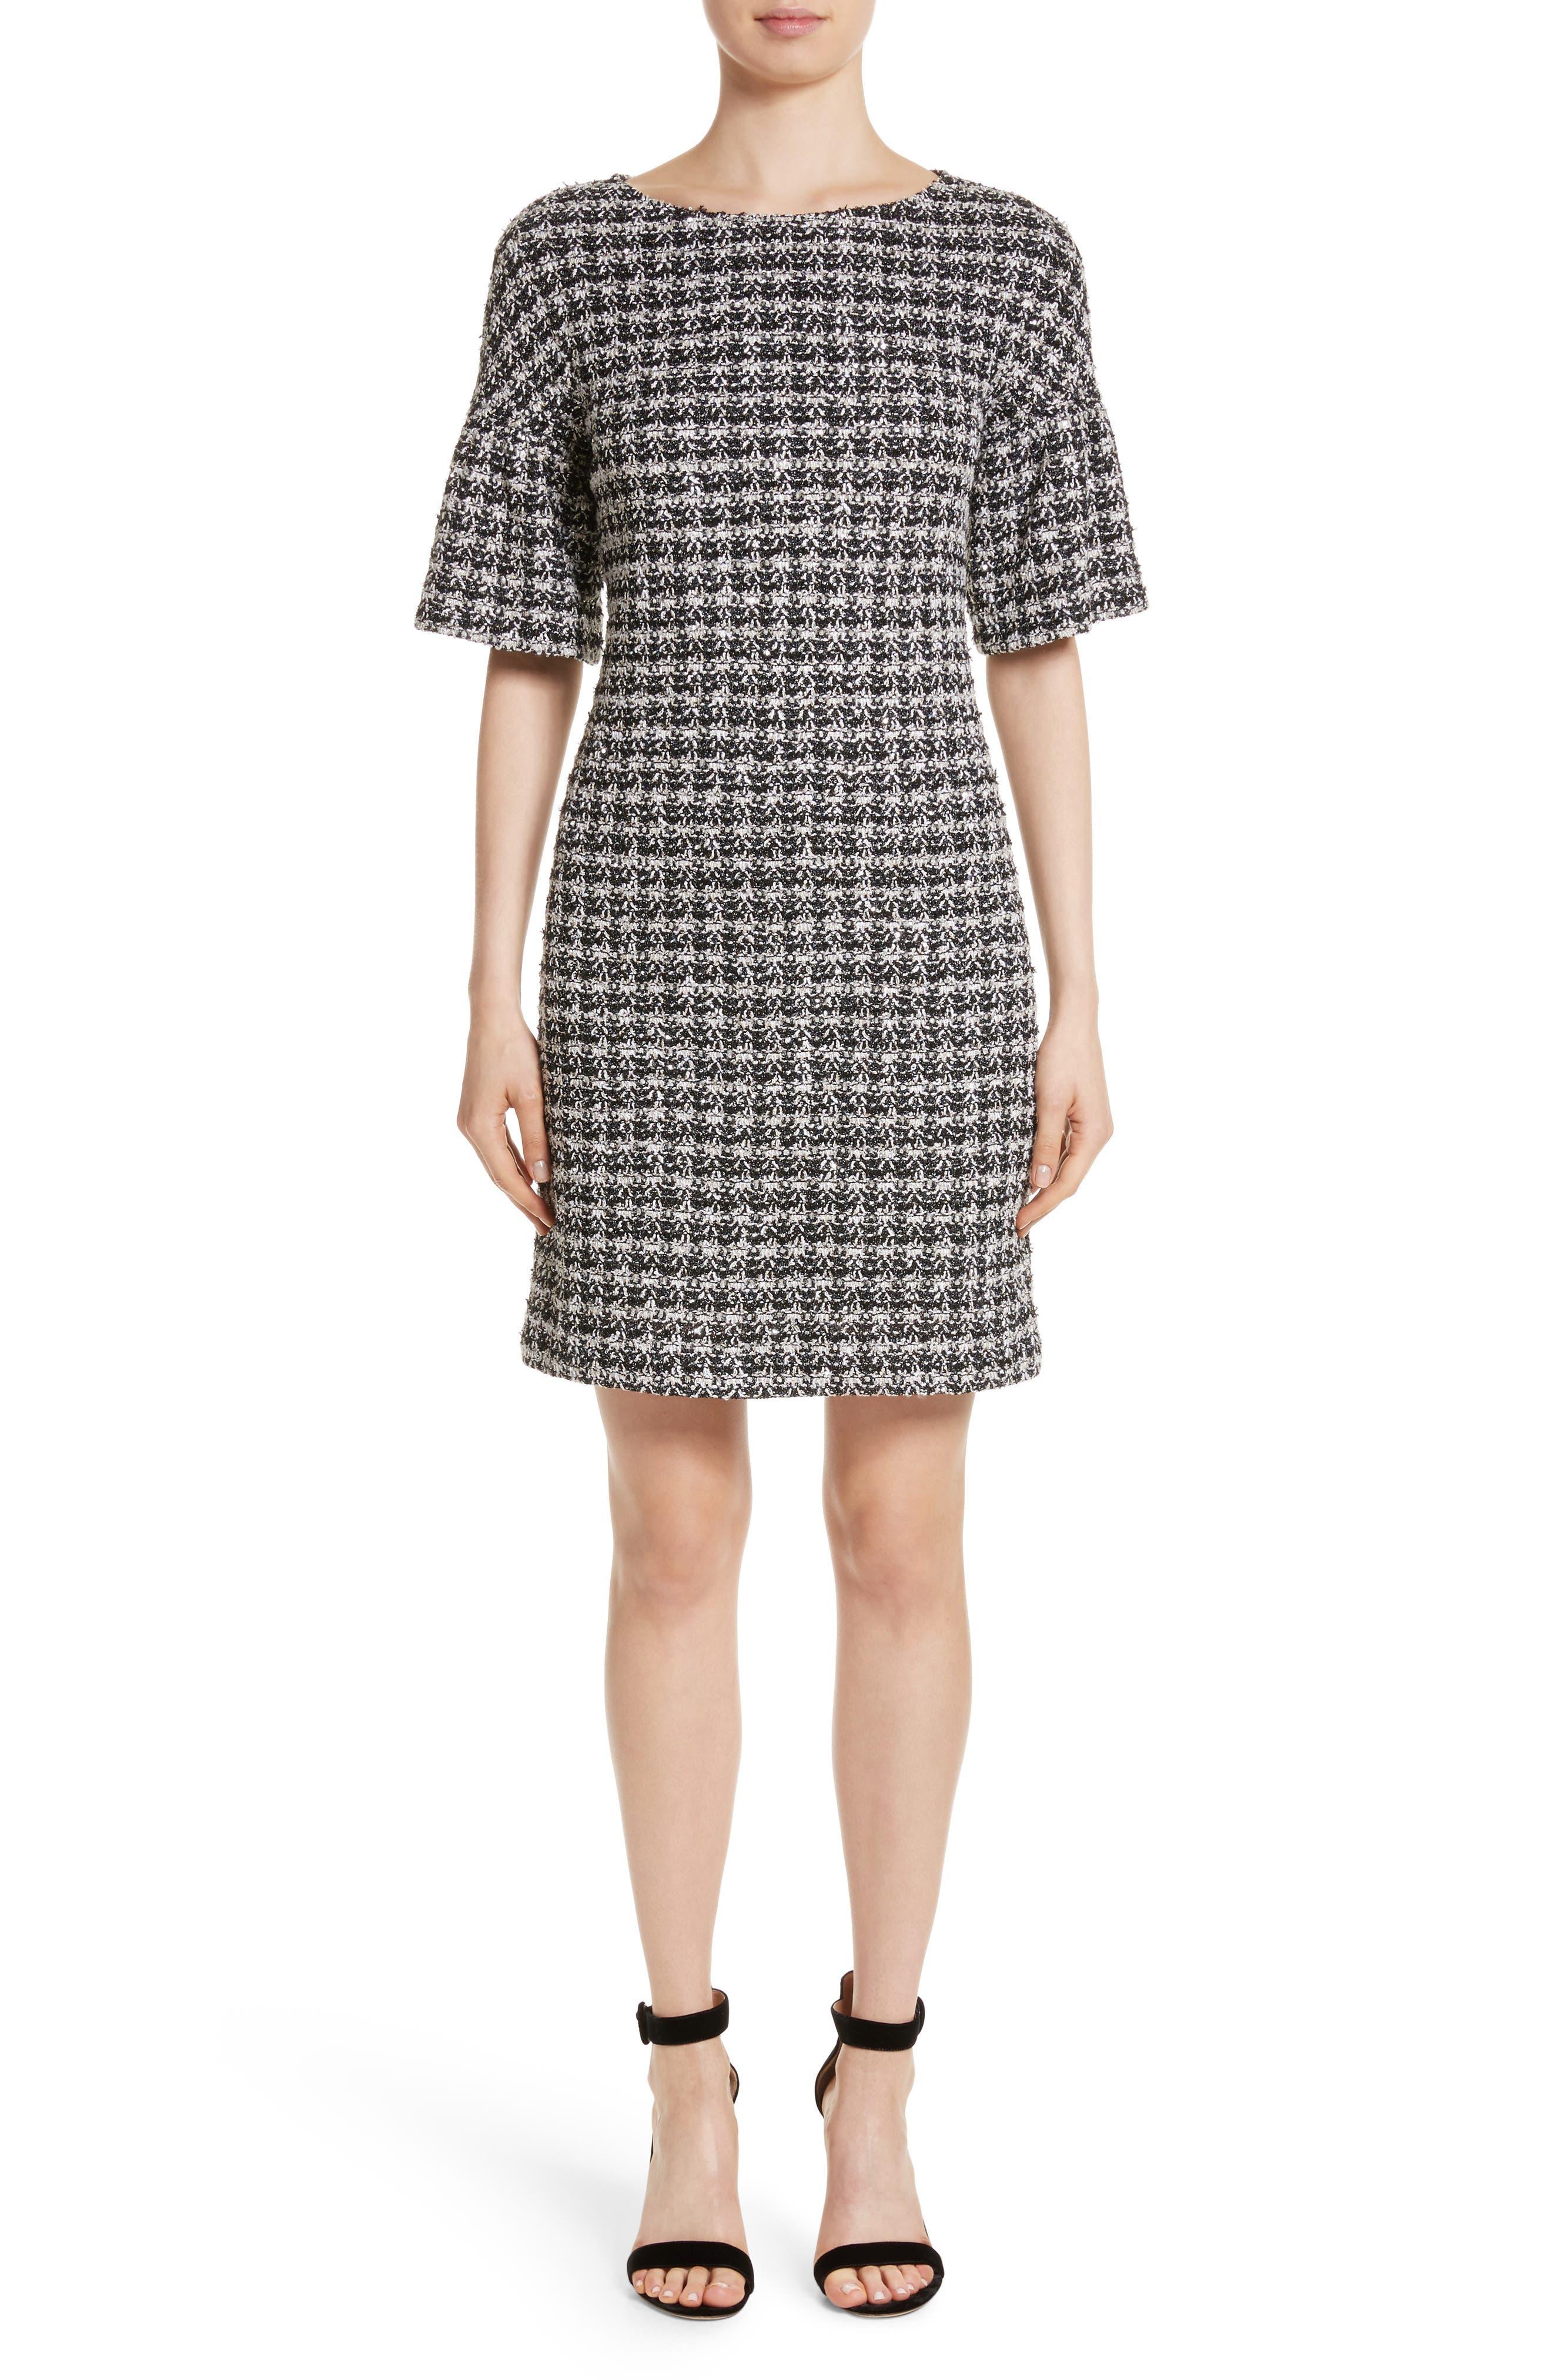 Main Image - St. John Collection Metallic Tweed Bell Sleeve Dress